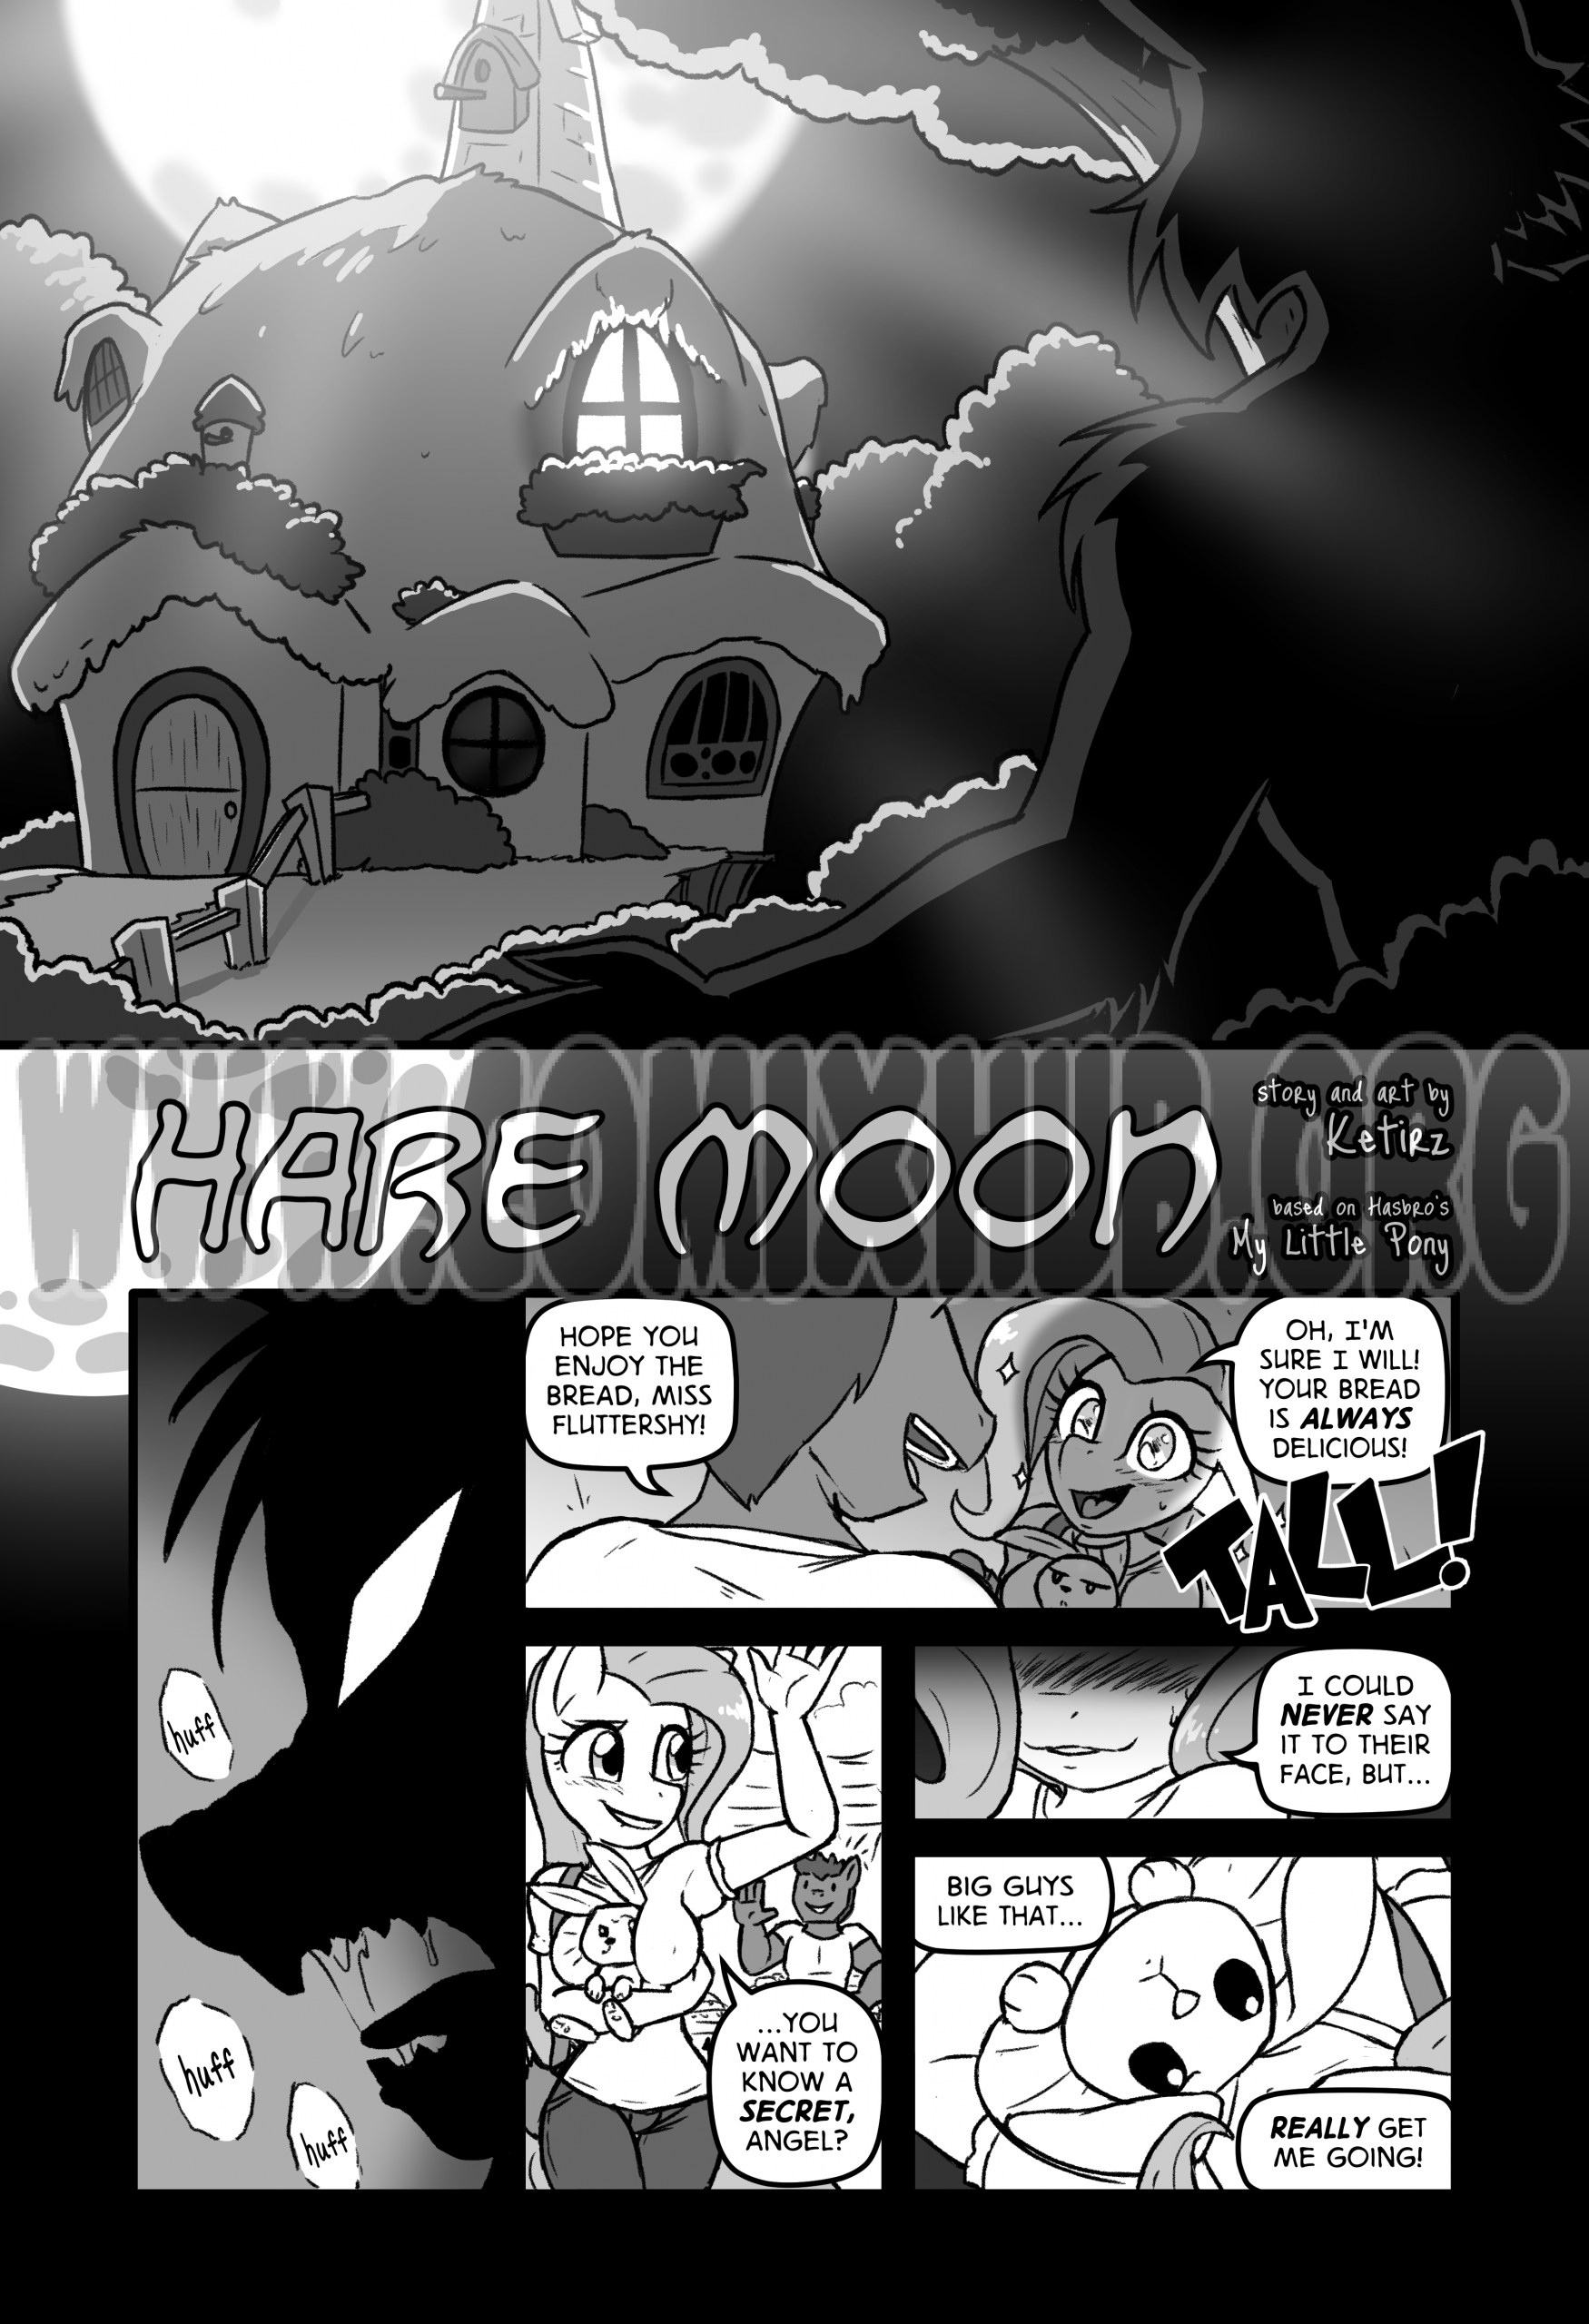 Hare Moon Masturbation, Furry